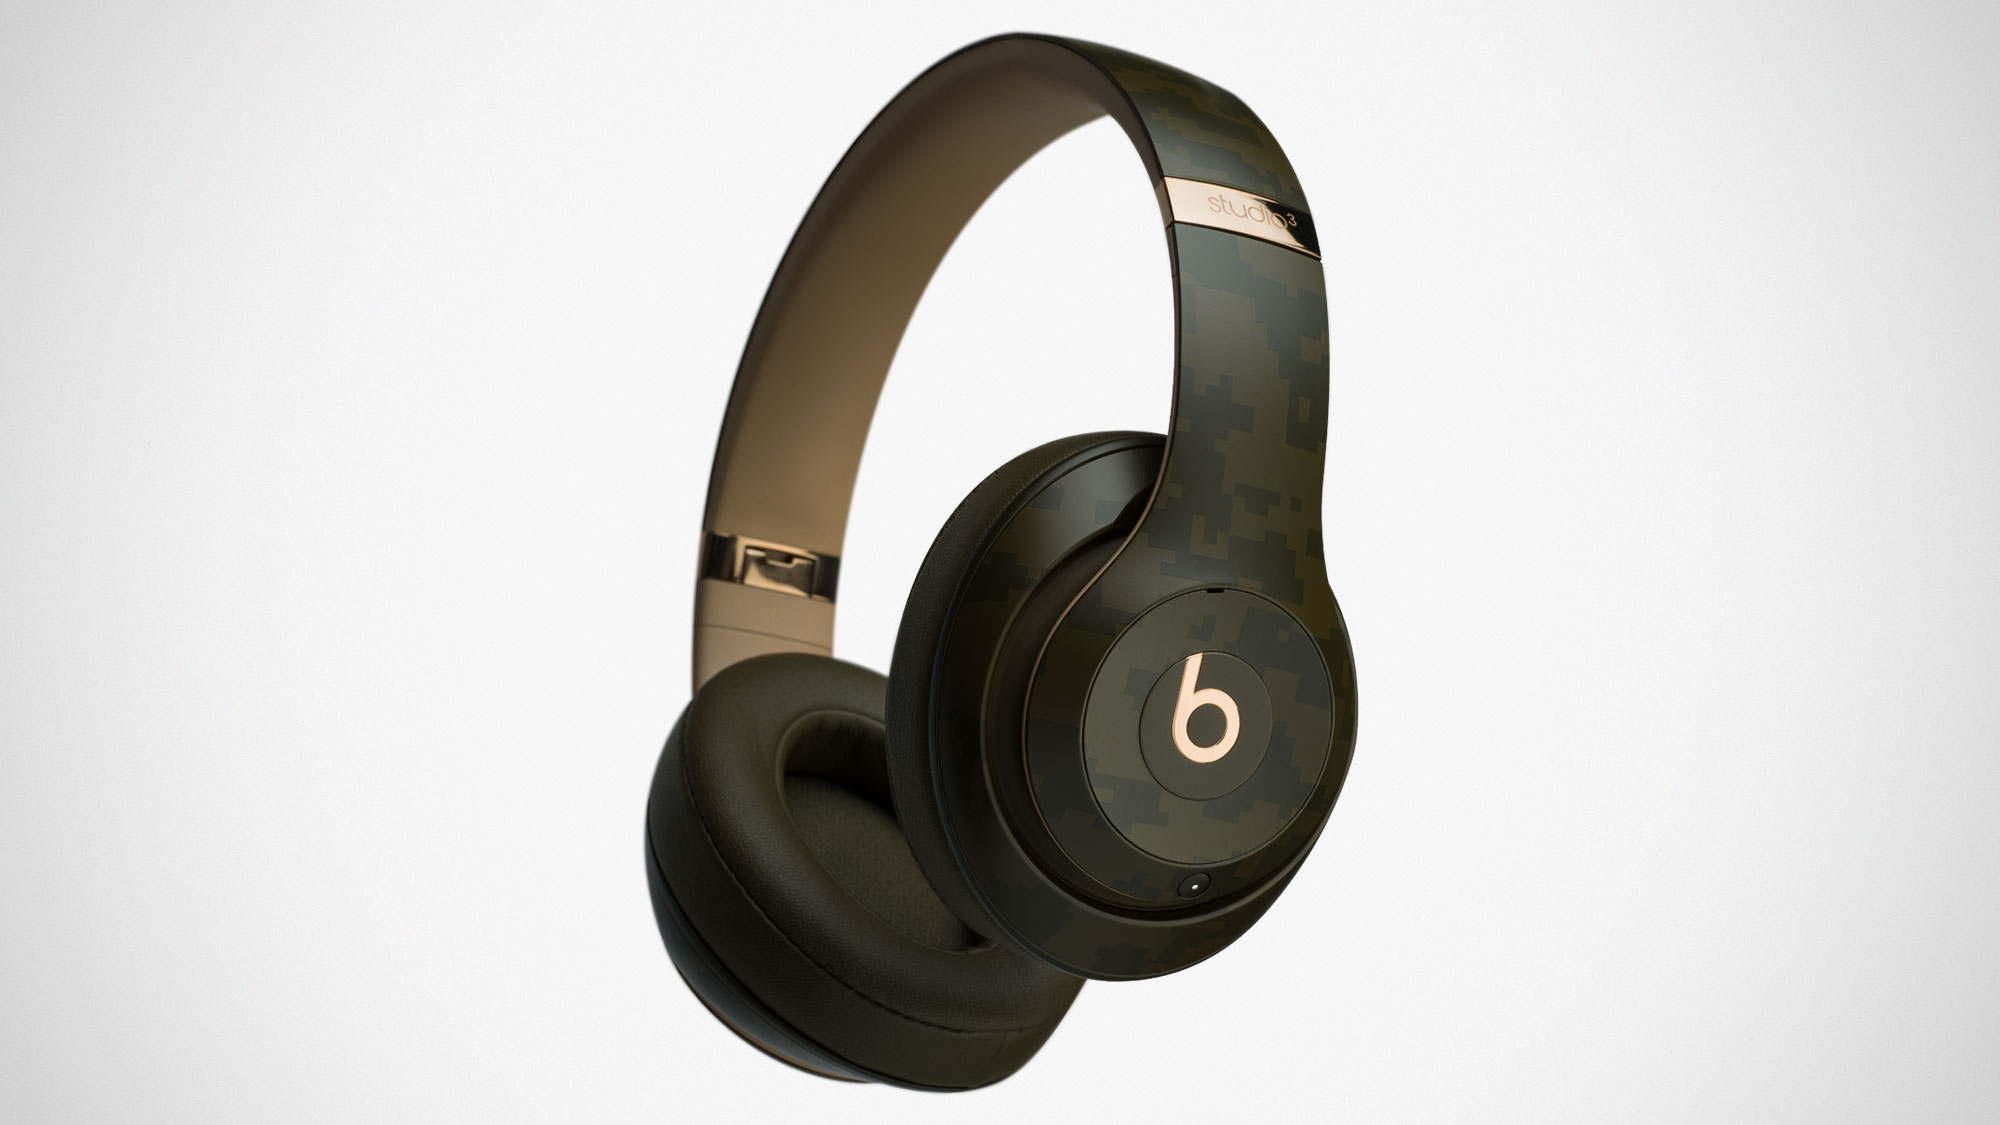 Beats Studio3 Wireless Headphones Now Comes In Camouflage Colorway Shouts